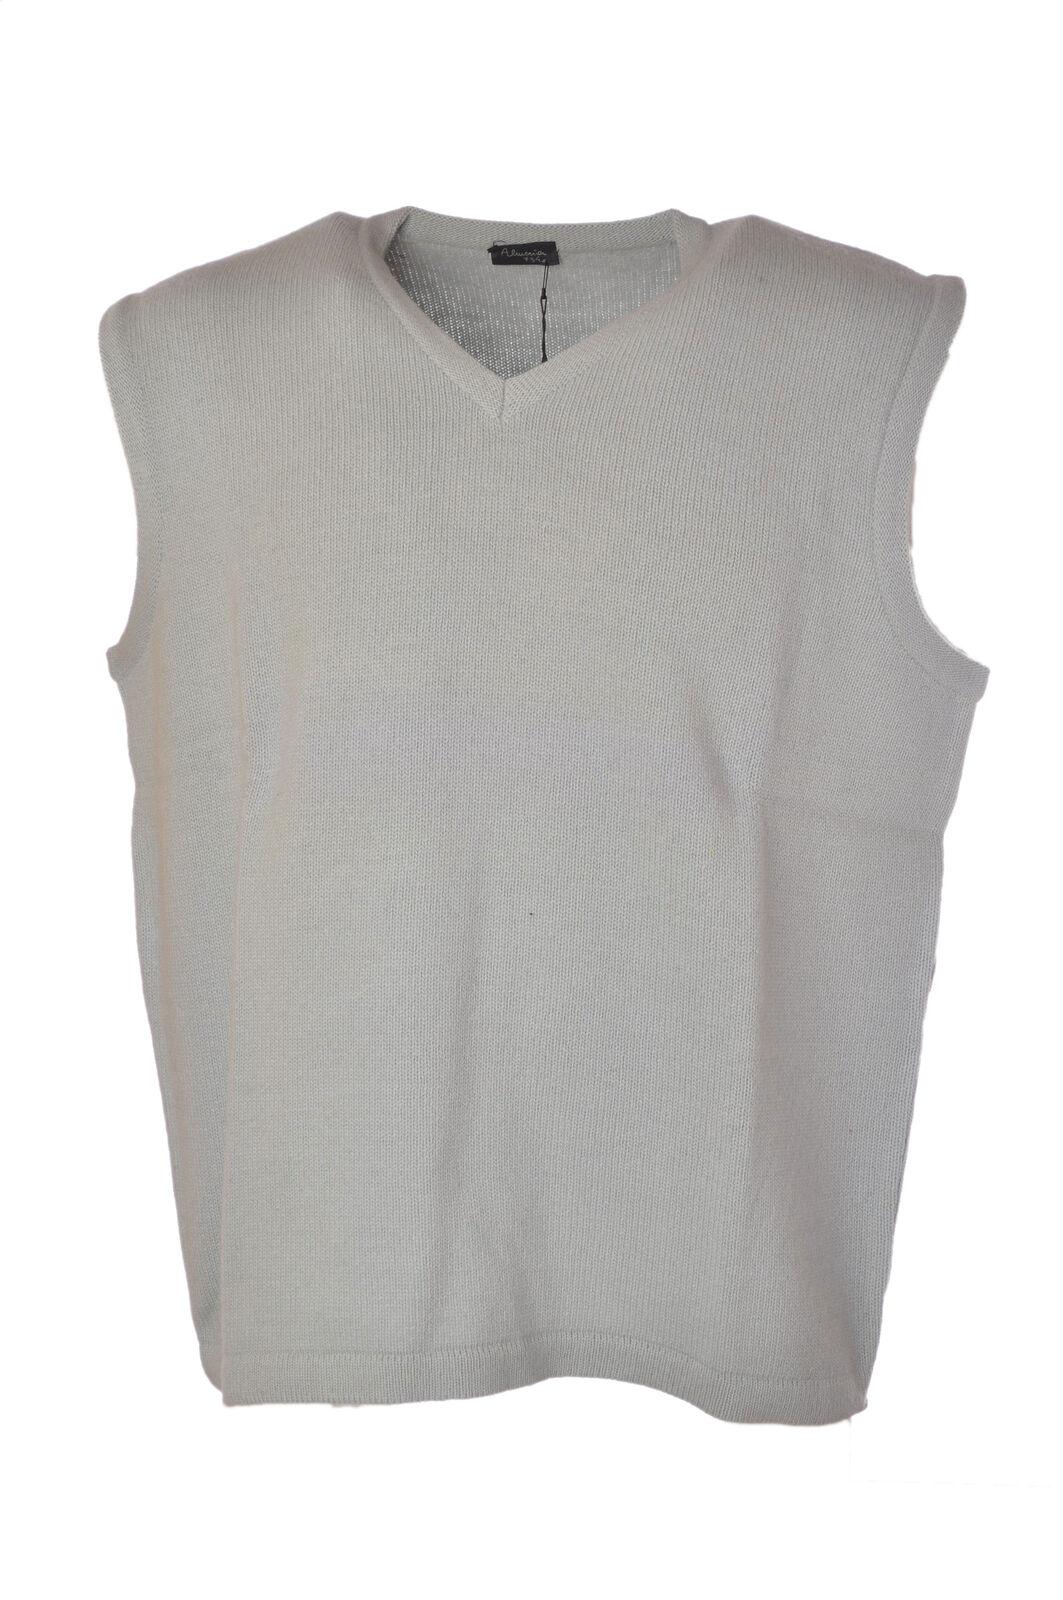 Almeria  -  Sweaters - Male - bluee - 2833531N173607